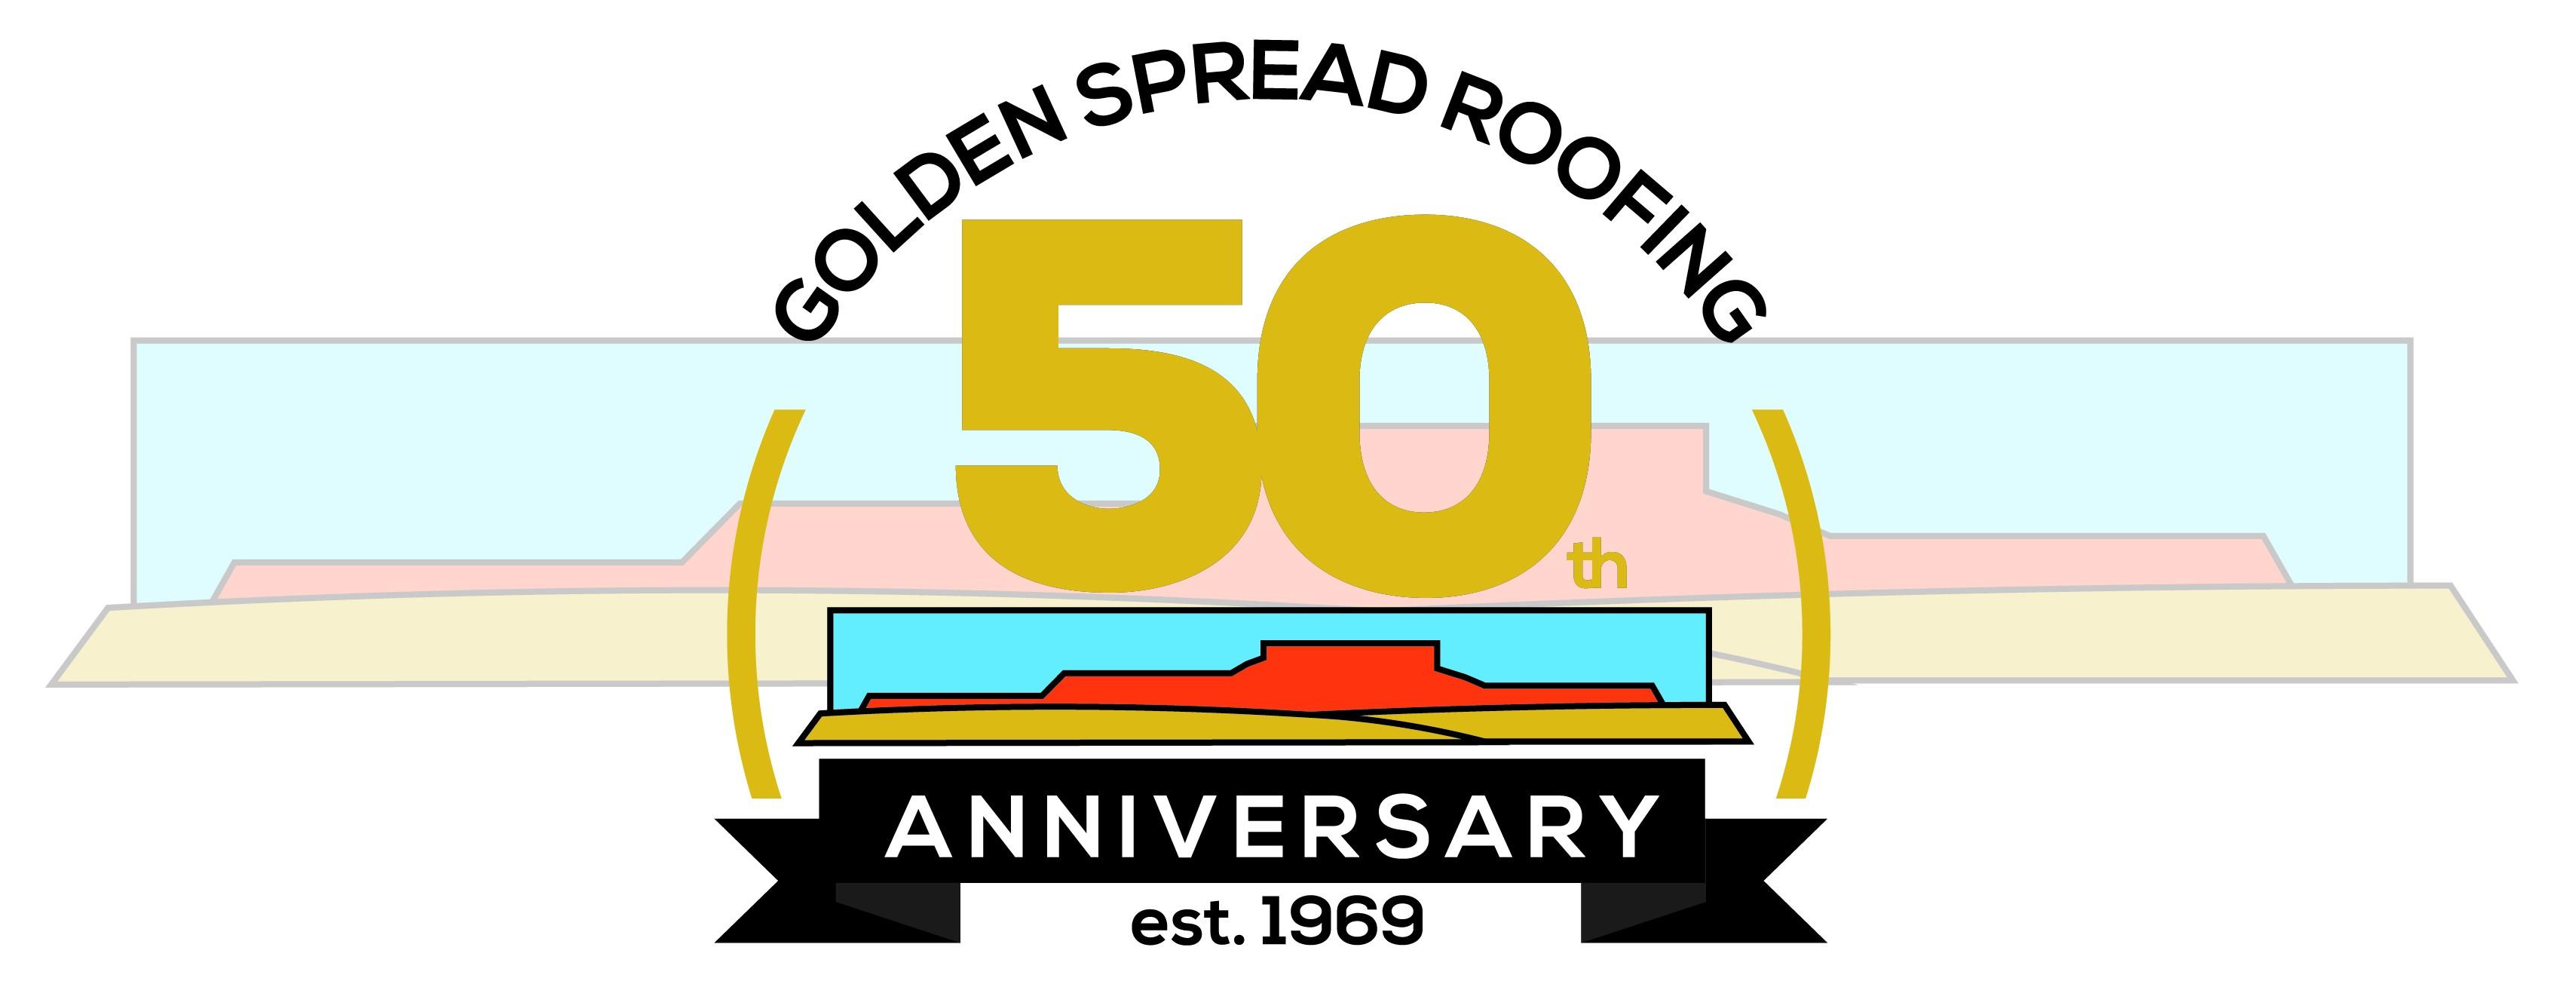 Golden Spread Roofing Linkedin